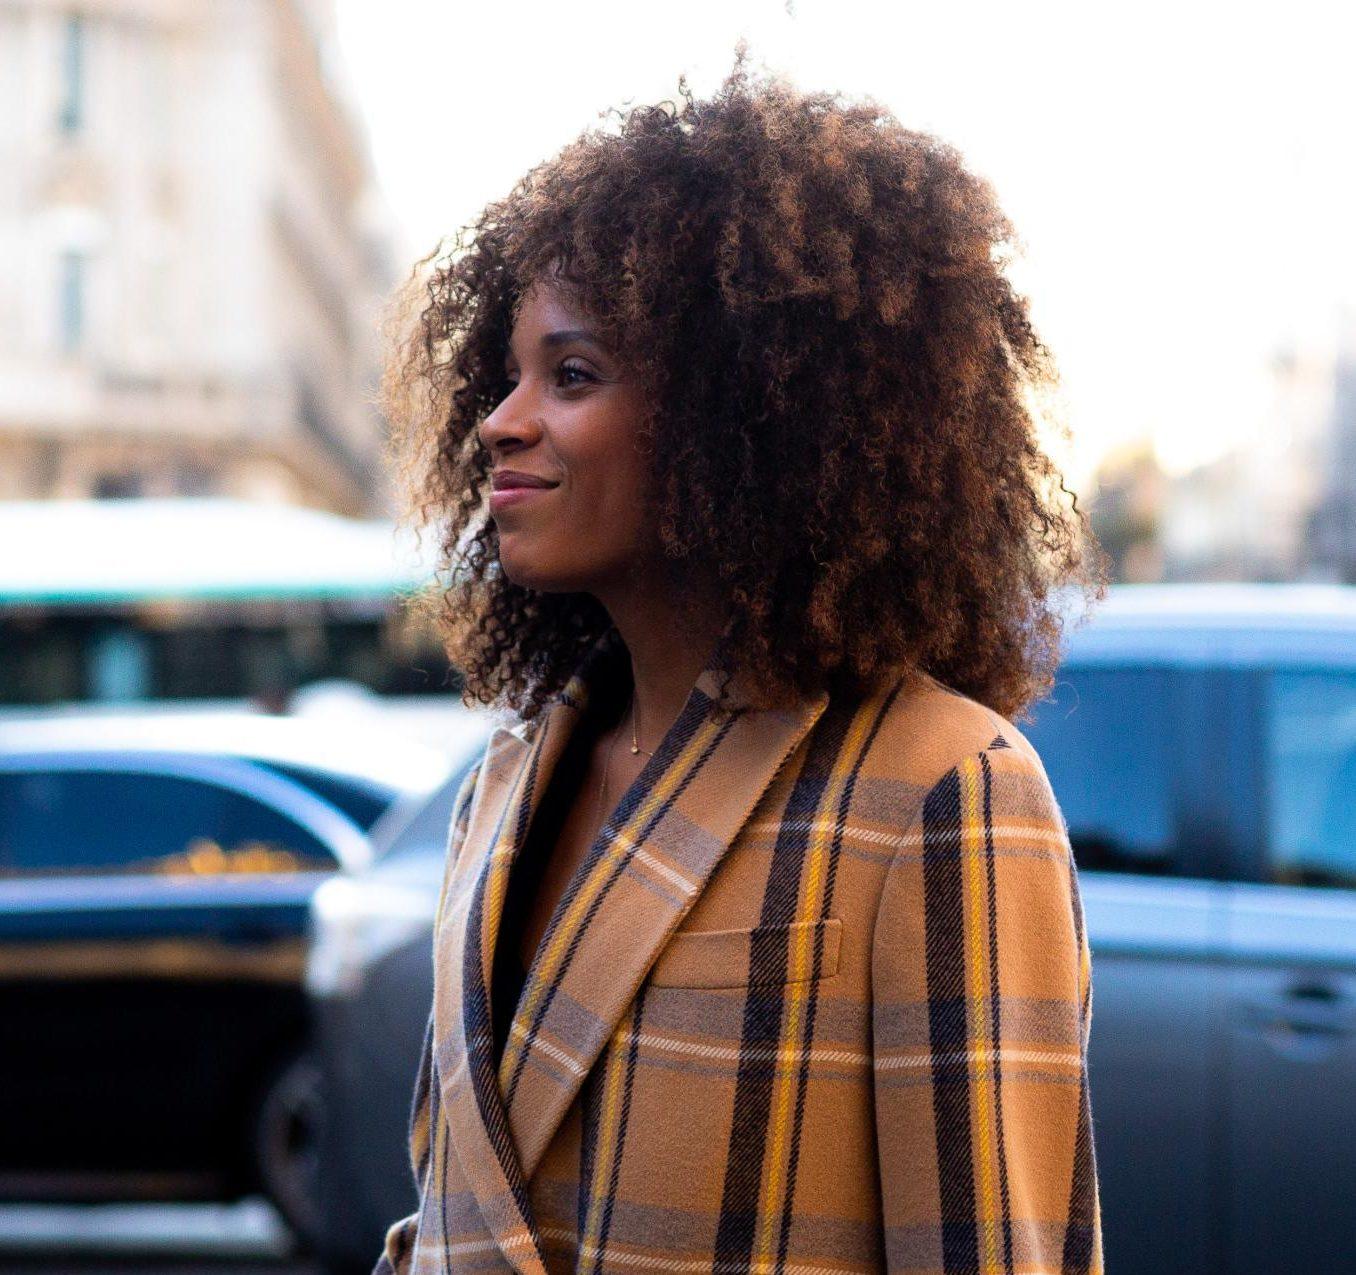 Modelo na rua cabelo médio afro